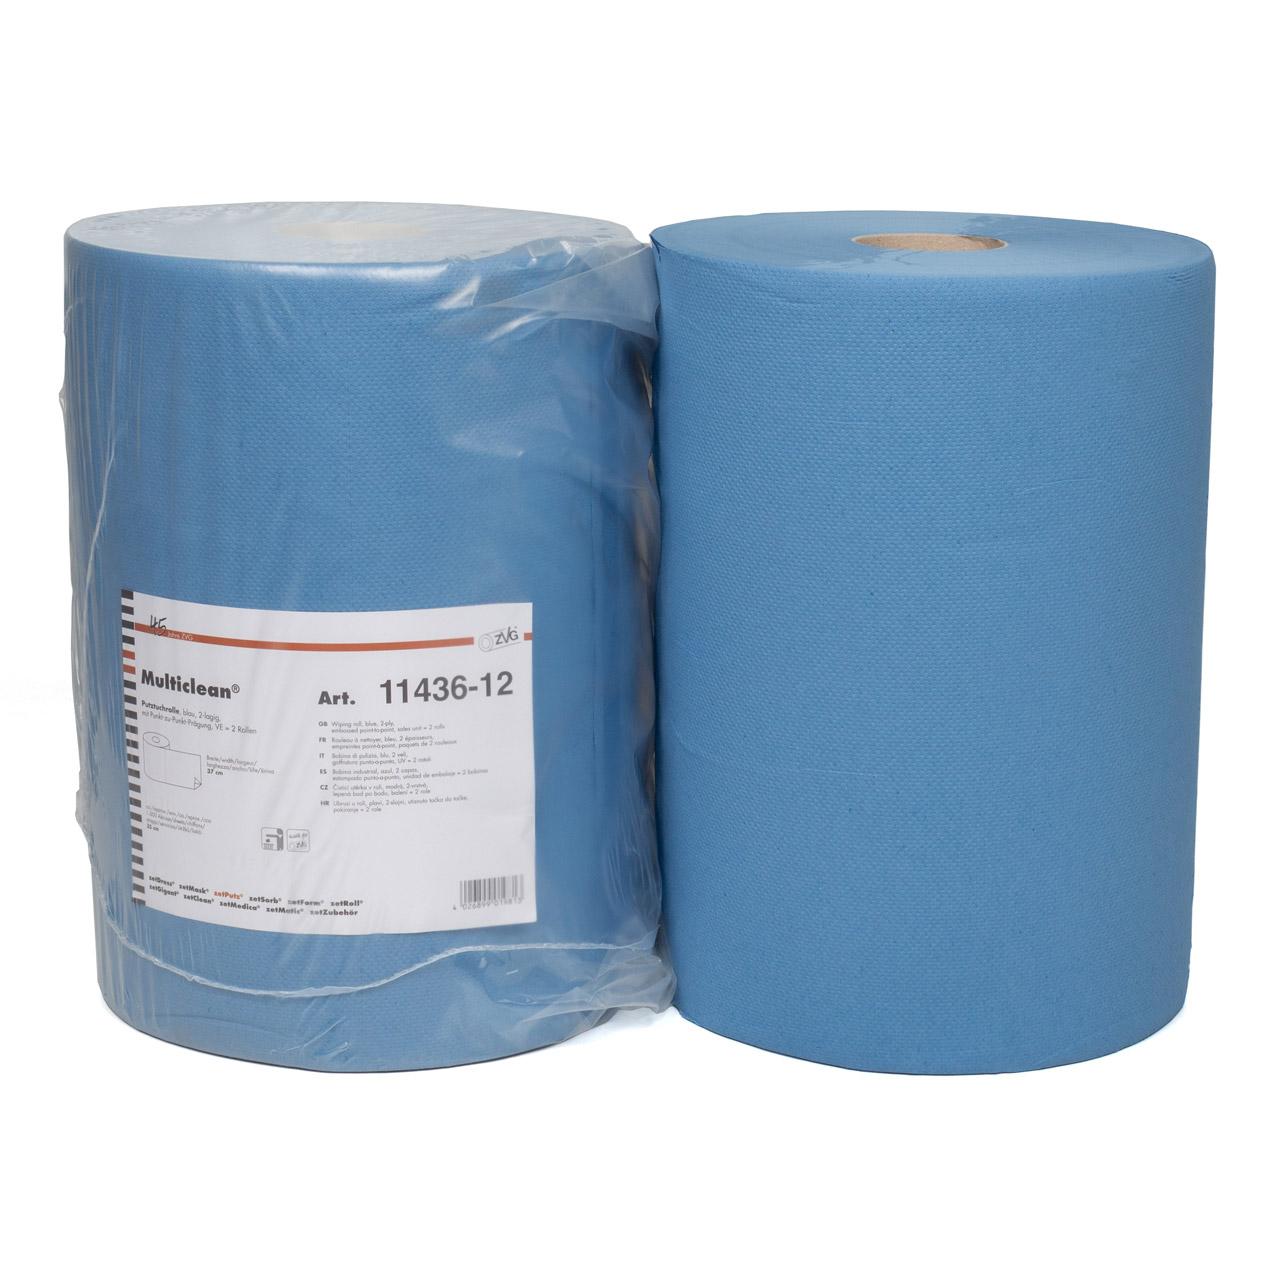 2x Papiertücher Putztücher Rolle Putztuchrolle Papiertücherrolle 2-LAGIG 37cm